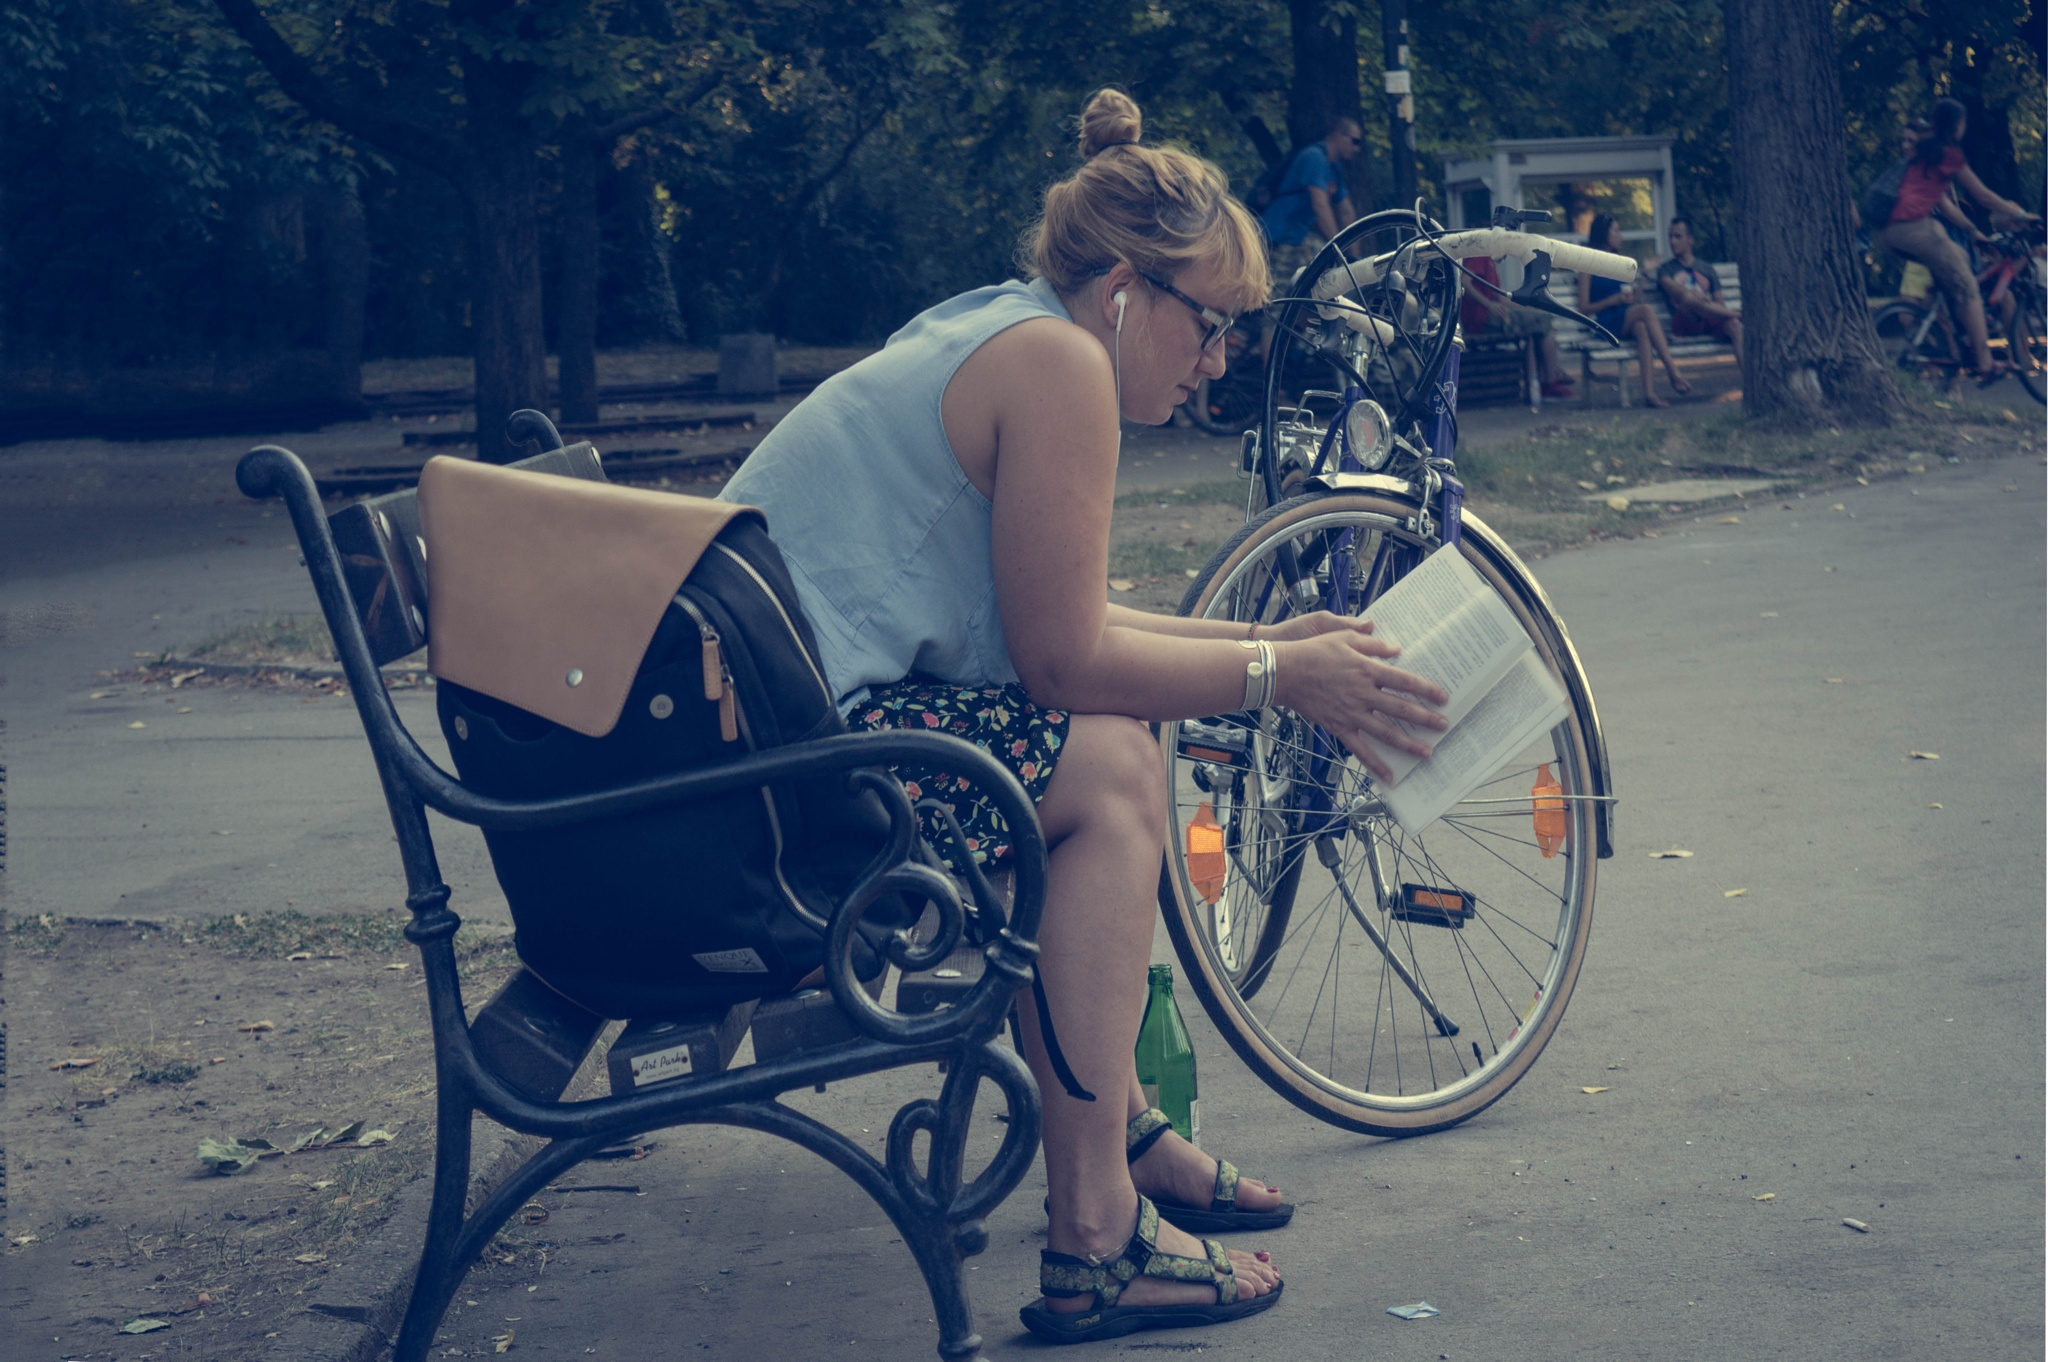 Woman reading book in park by Hristina Hristova